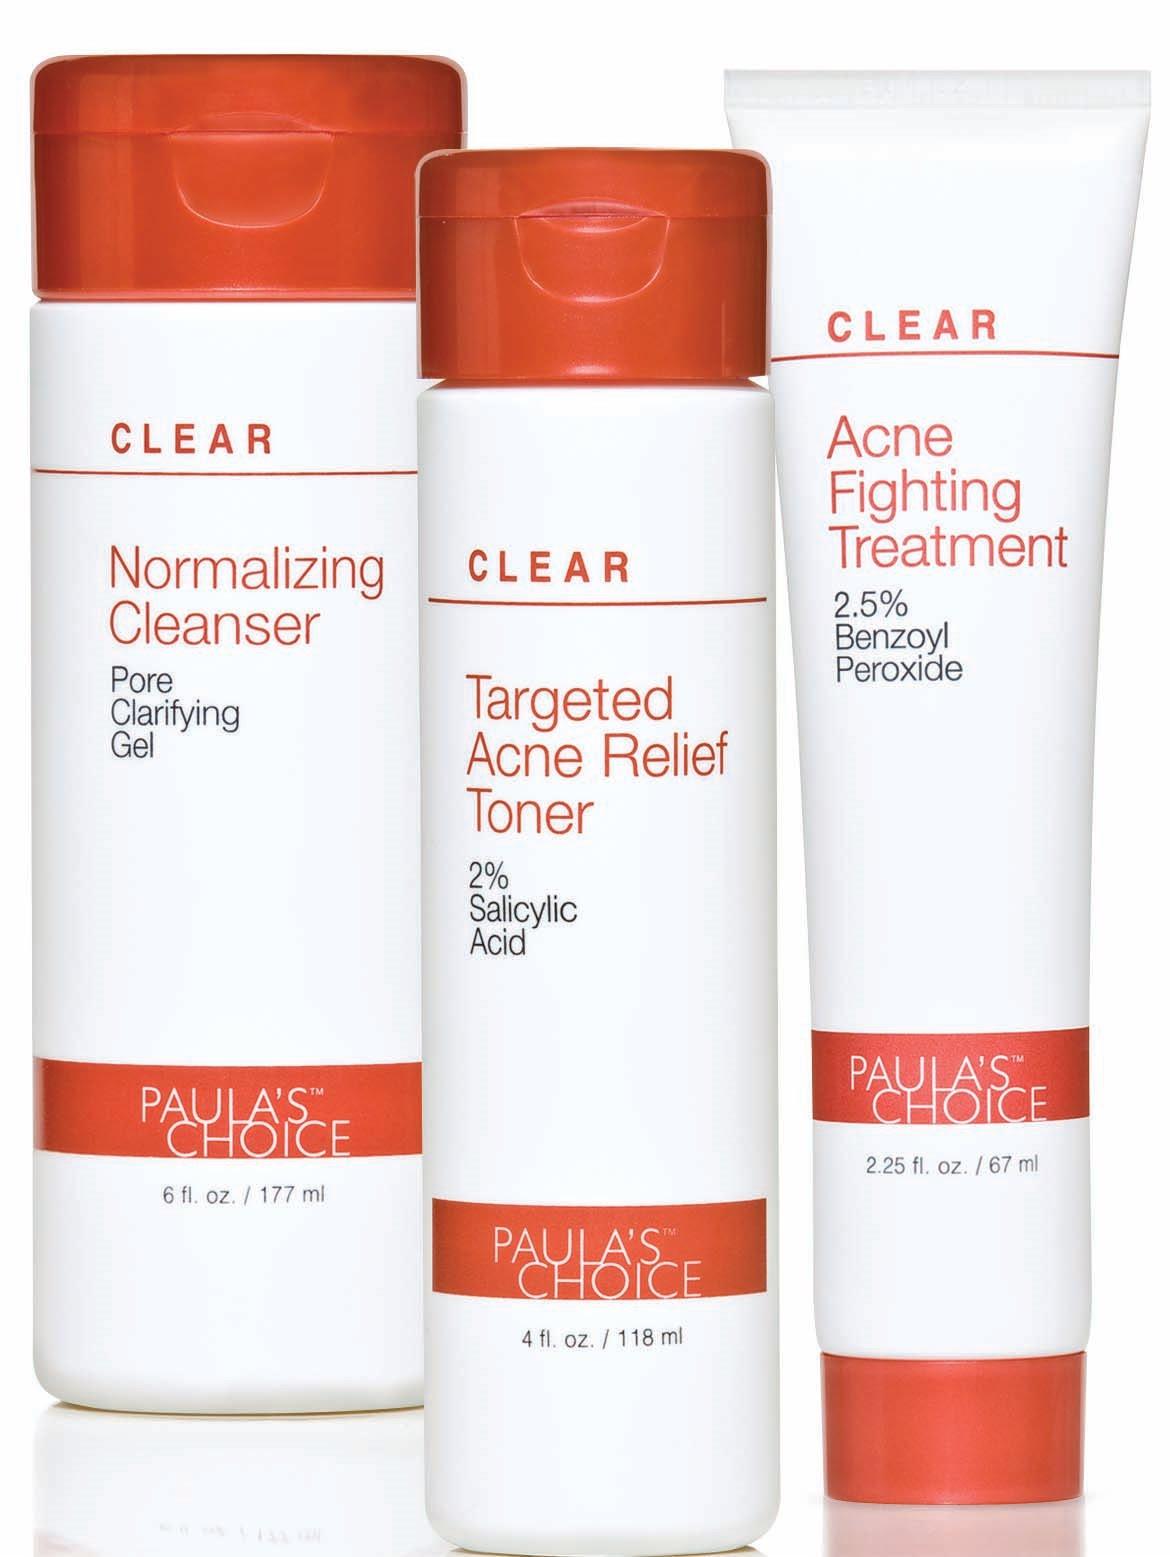 skincare cosmetics retinol, dermalogica cosmetics, skincare cosmetics retinol review, skincare cosmetics retinol night cream, skincare cosmetics retinol eye gel, skincare cosmetics retinol day cream, neutrogena cosmetics, obagi cosmetics-54